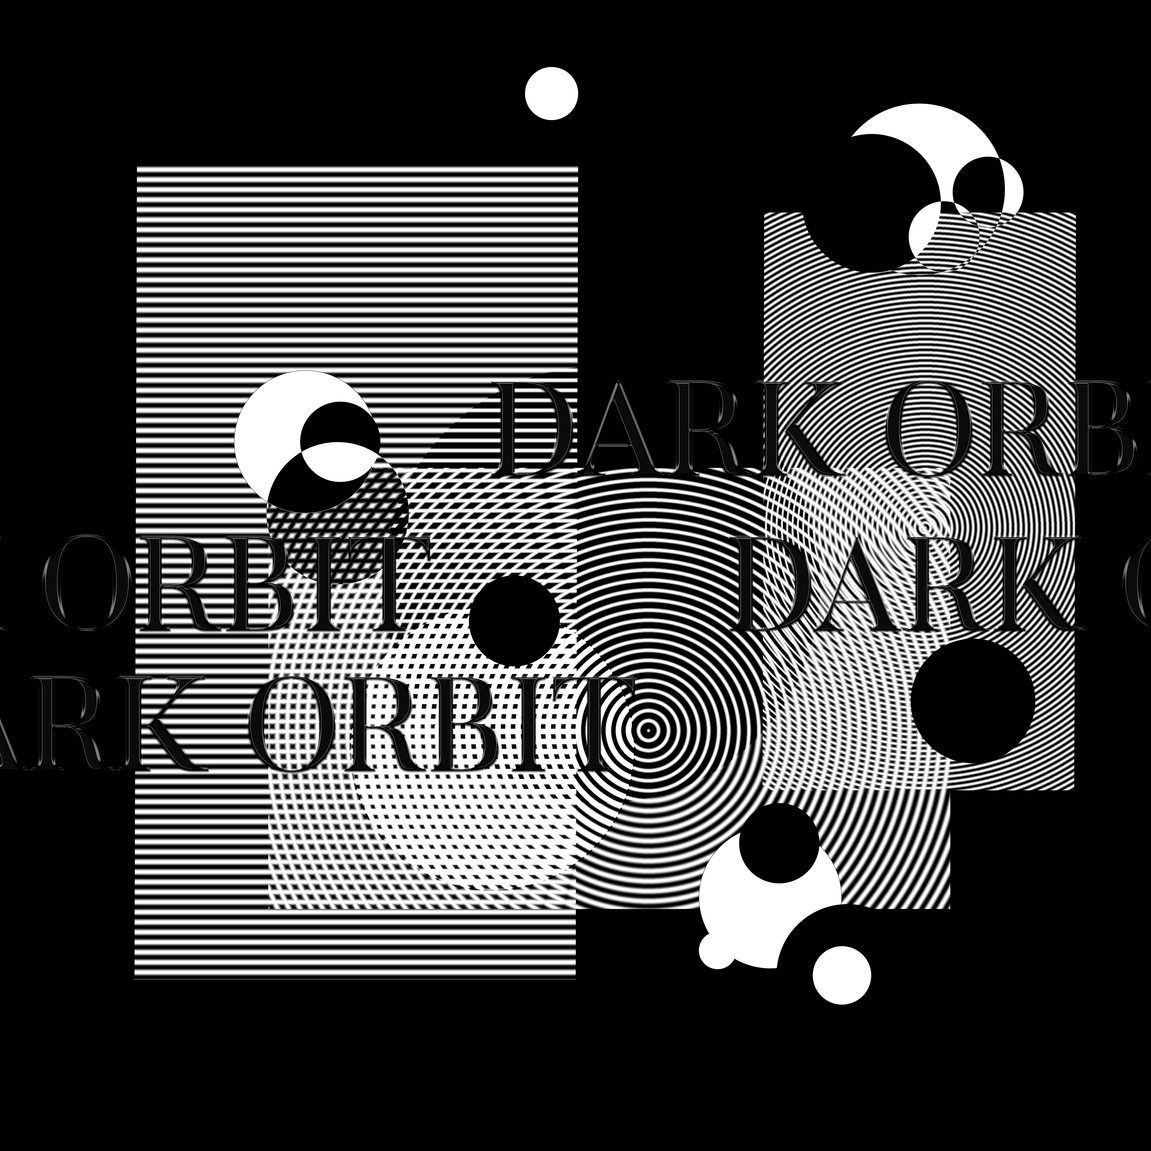 darkorbit2.jpg